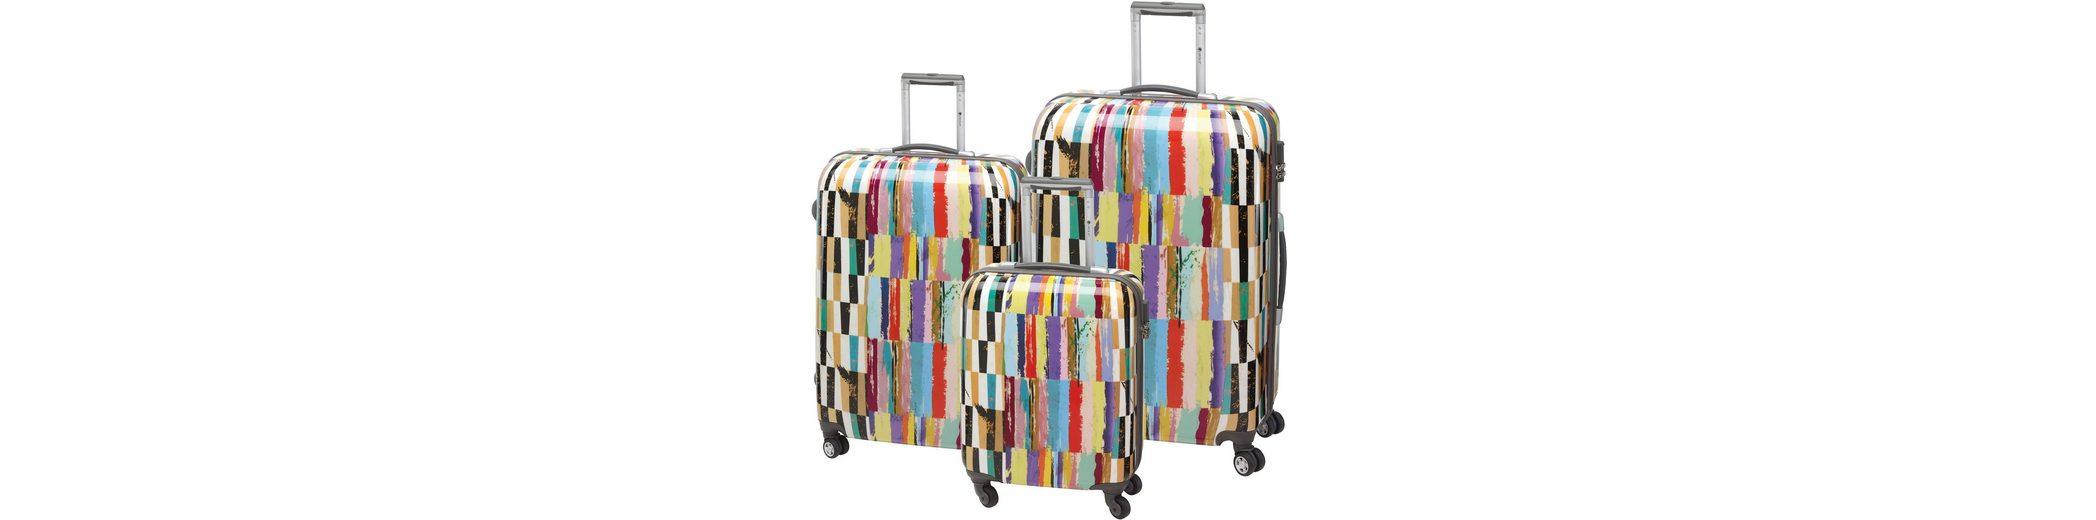 CHECK.IN® Hartschalentrolley Set mit 4 Zwillingsrollen, 3tlg., »Aruba«